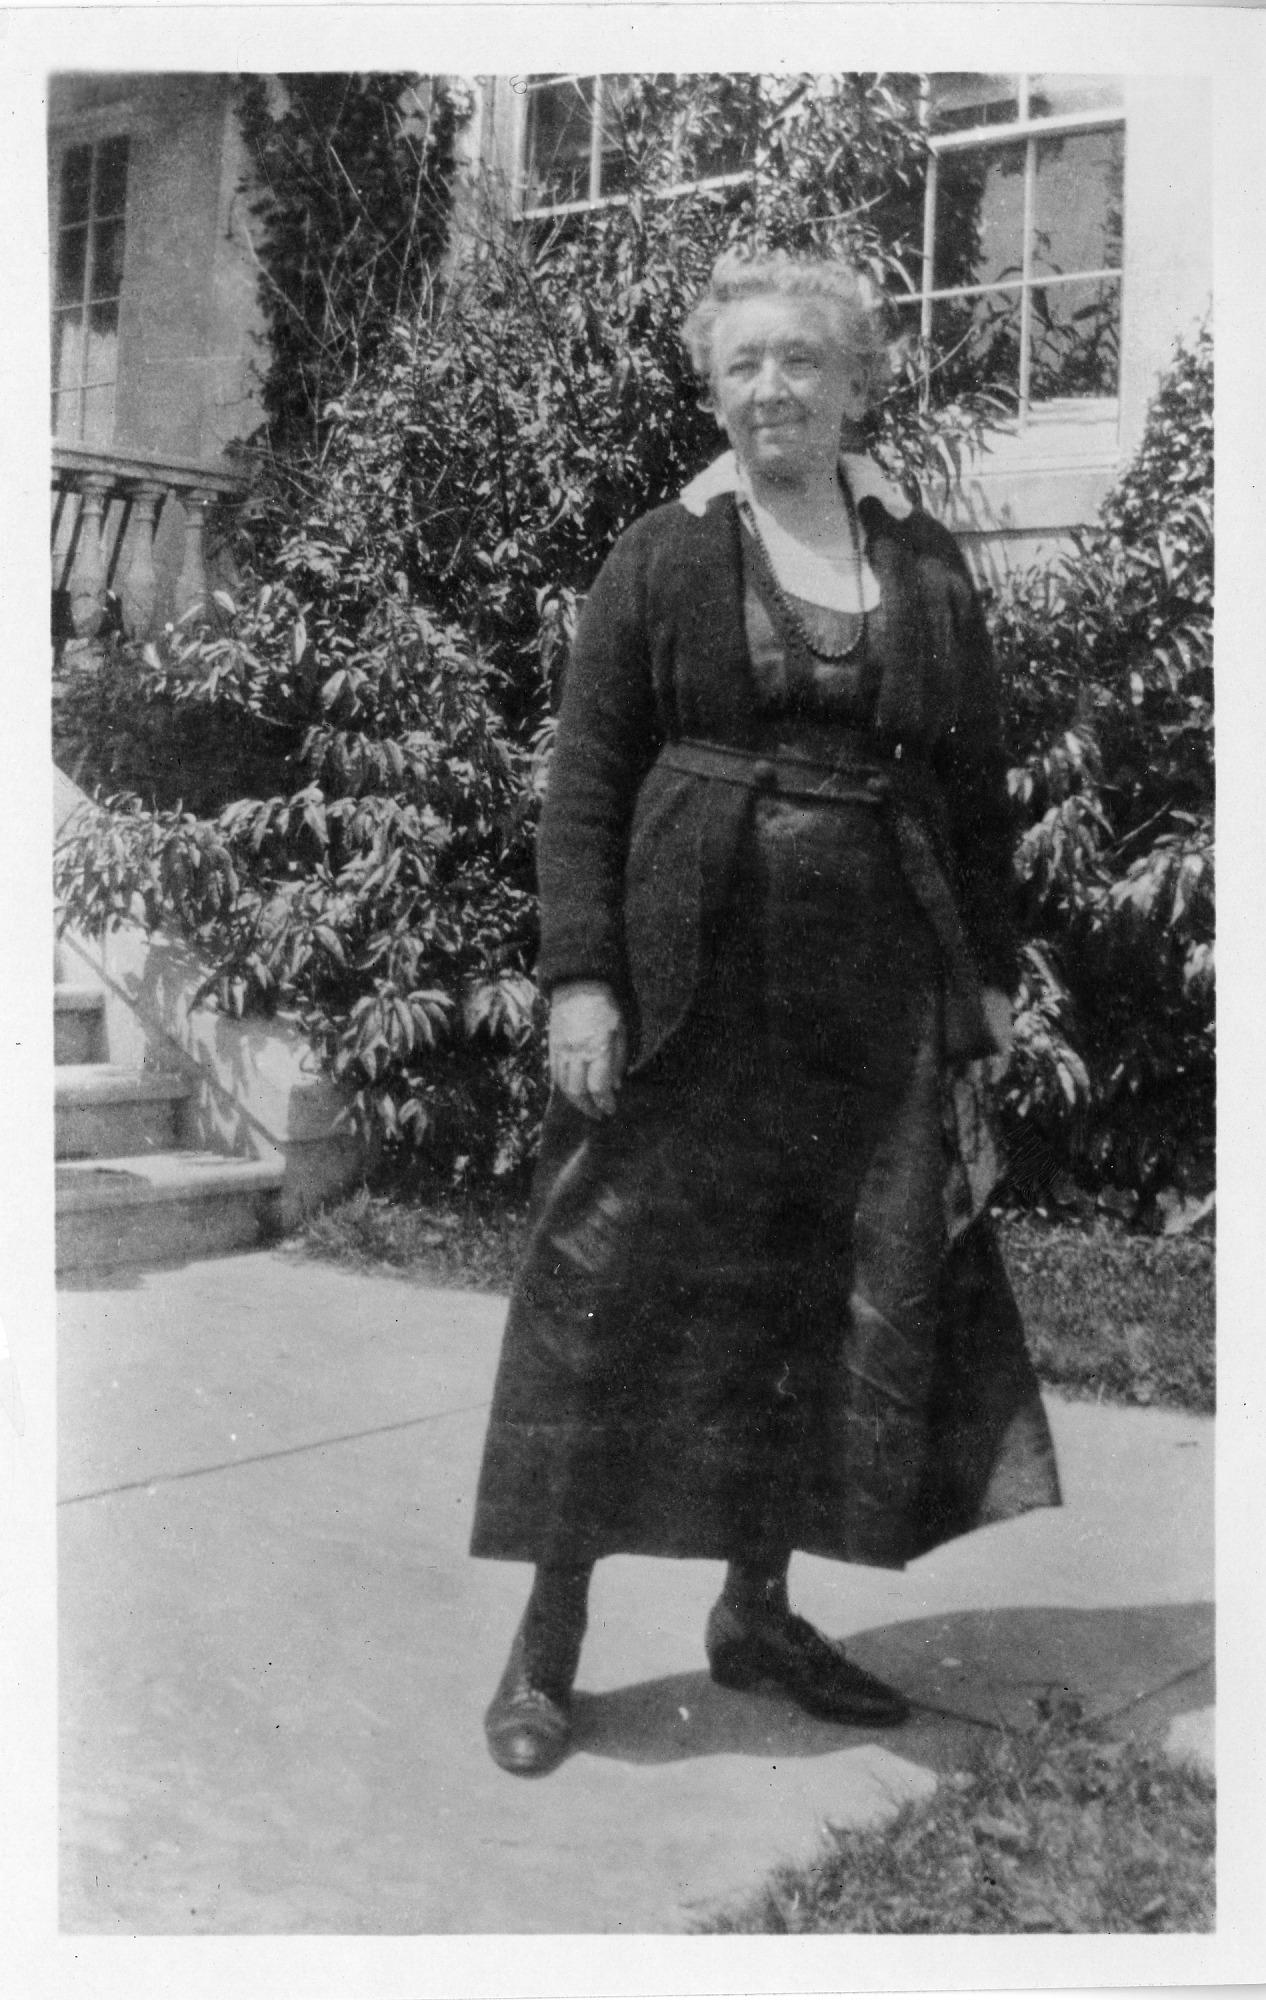 Cornelia Maria Clapp (1849-1934), Smithsonian Institution Archives, SIA Acc. 90-105 [SIA2008-0112].